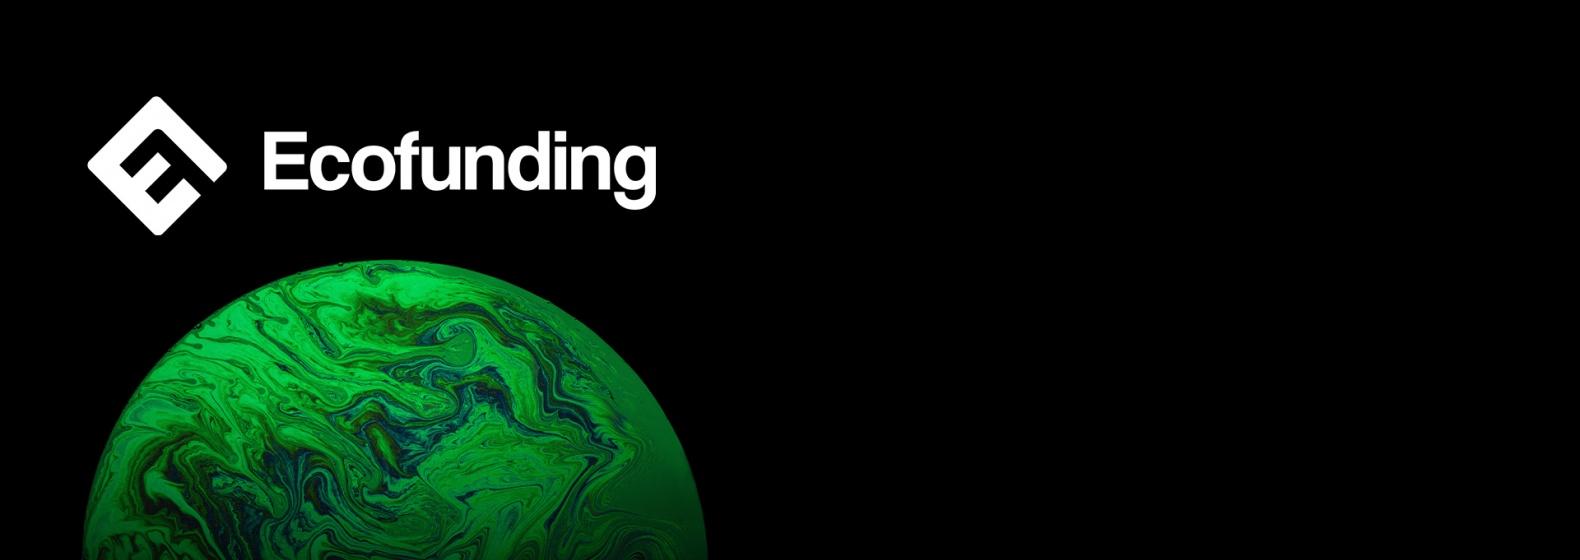 cover_ecofunding.jpg